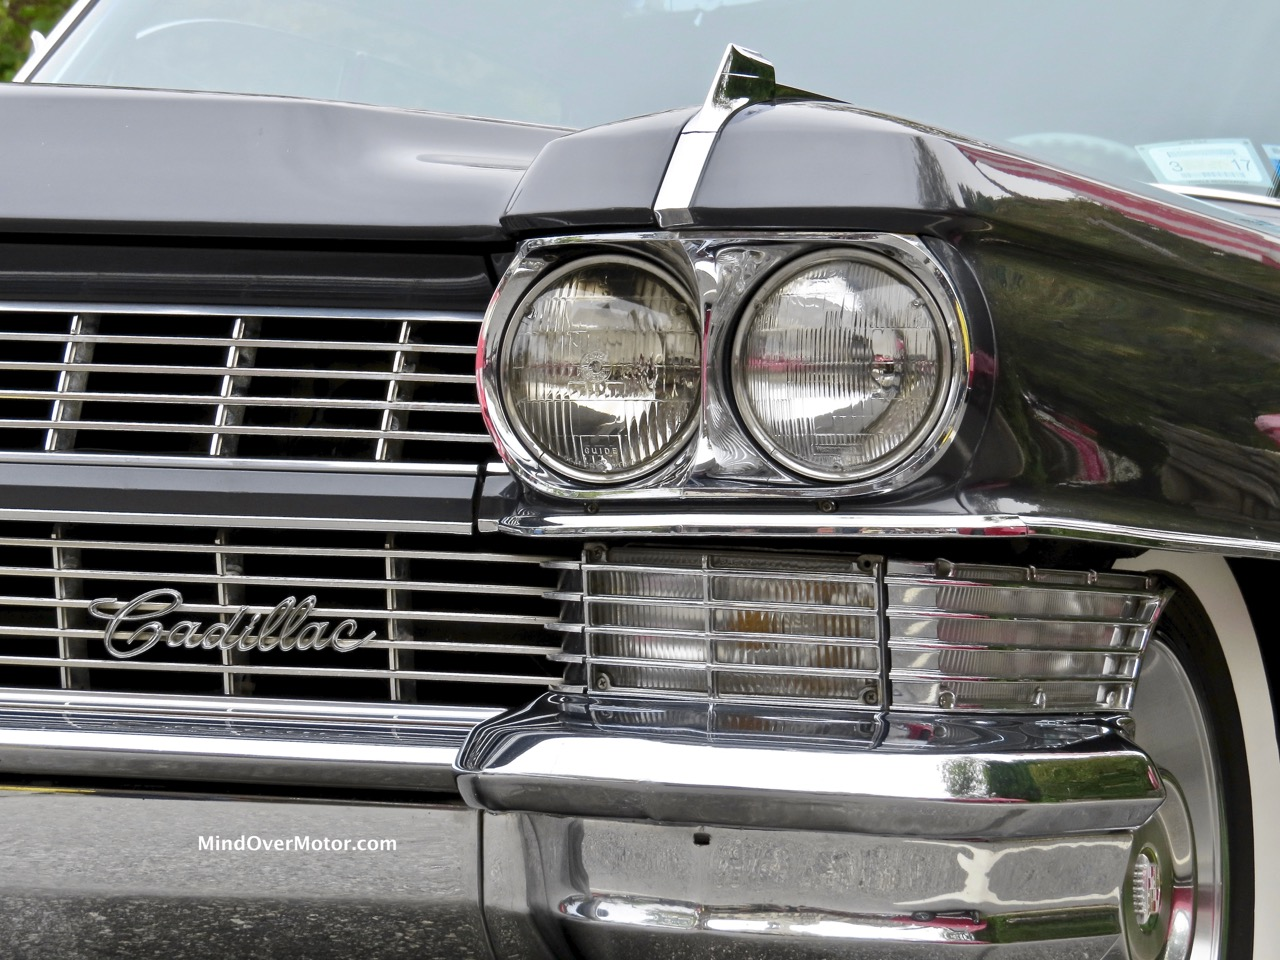 1964 Fleetwood Front Clip Detail